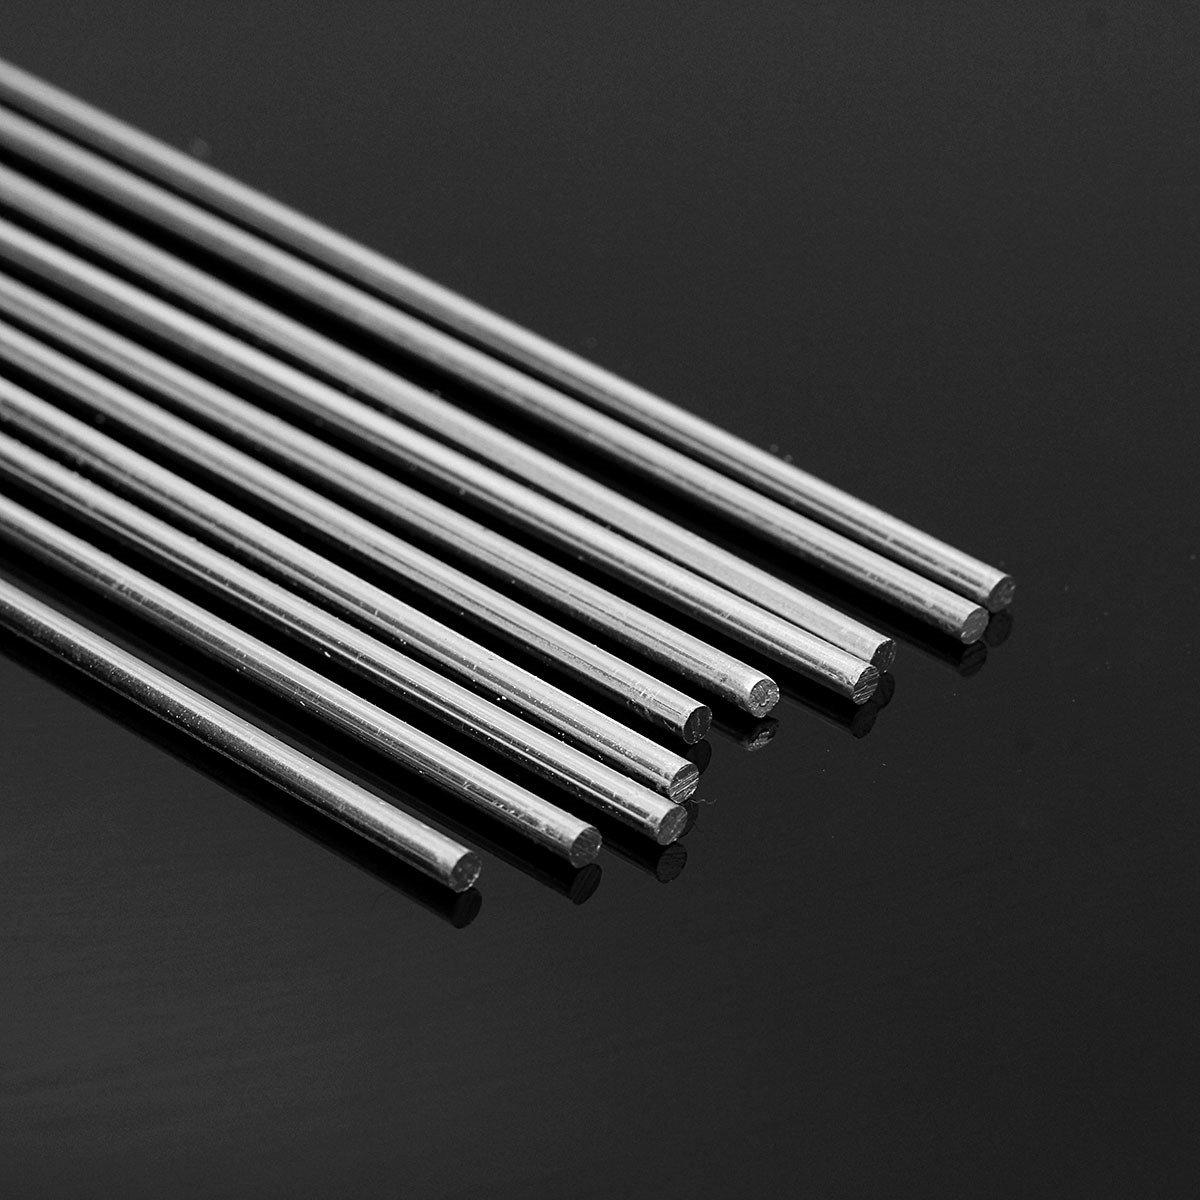 MASUNN 10Pcs 1.6 X330Mm Aleación De Aluminio Soldadura Plata Soldar ...